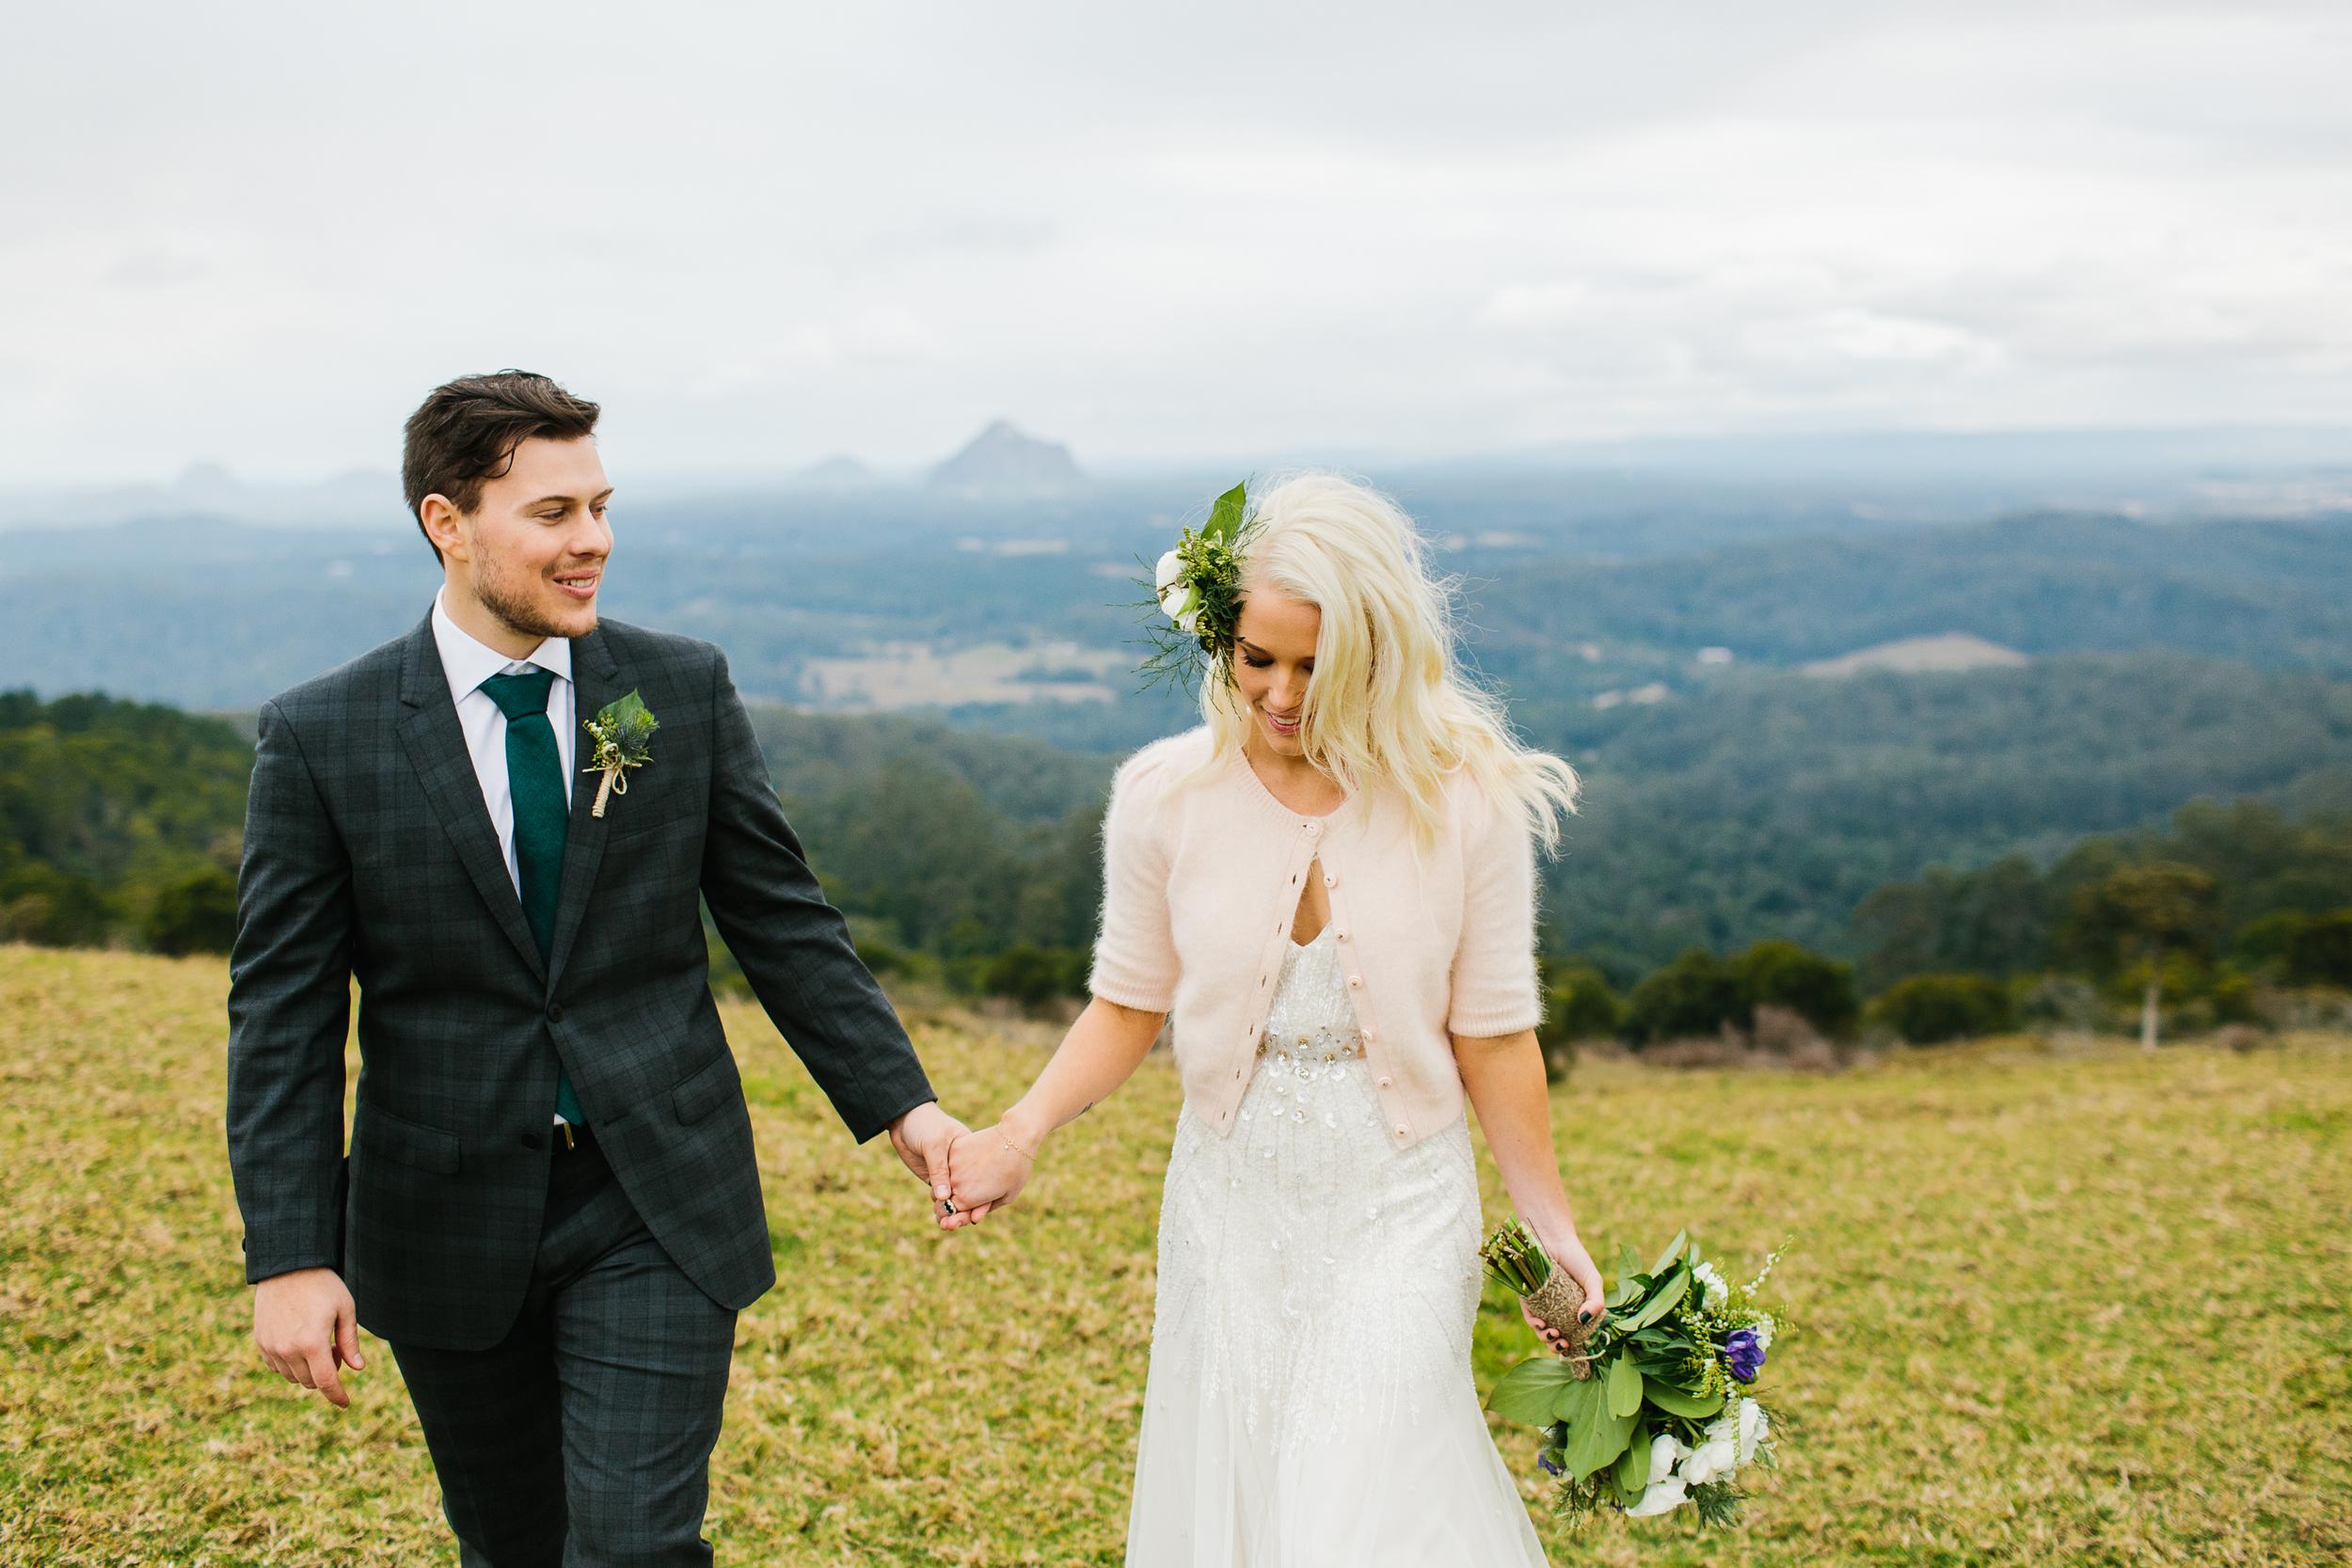 green-wedding-theme-groom-in-tartan-plaid